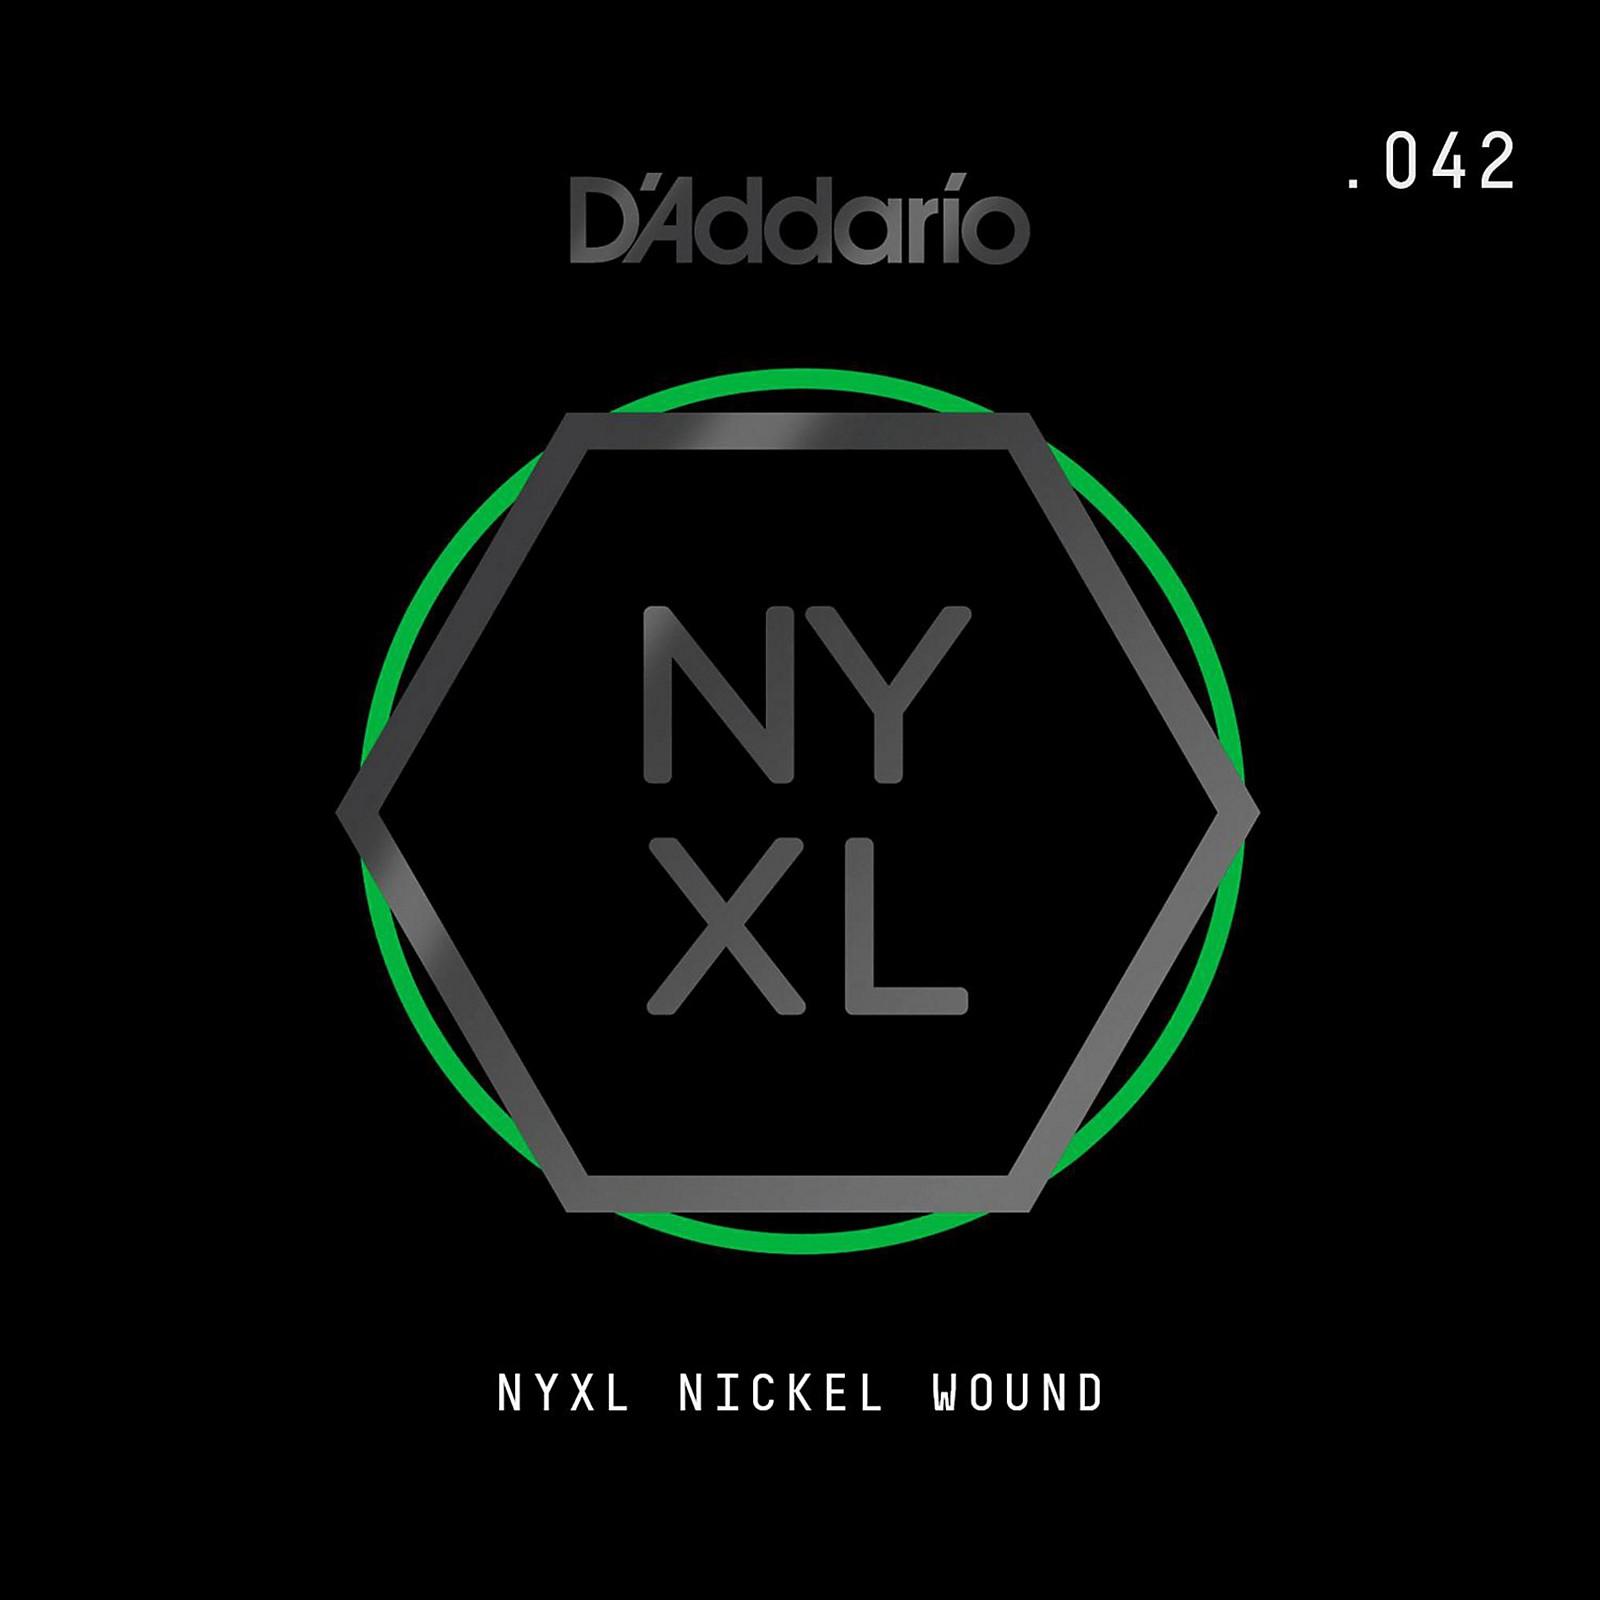 D'Addario NYNW042 NYXL Nickel Wound Electric Guitar Single String, .042